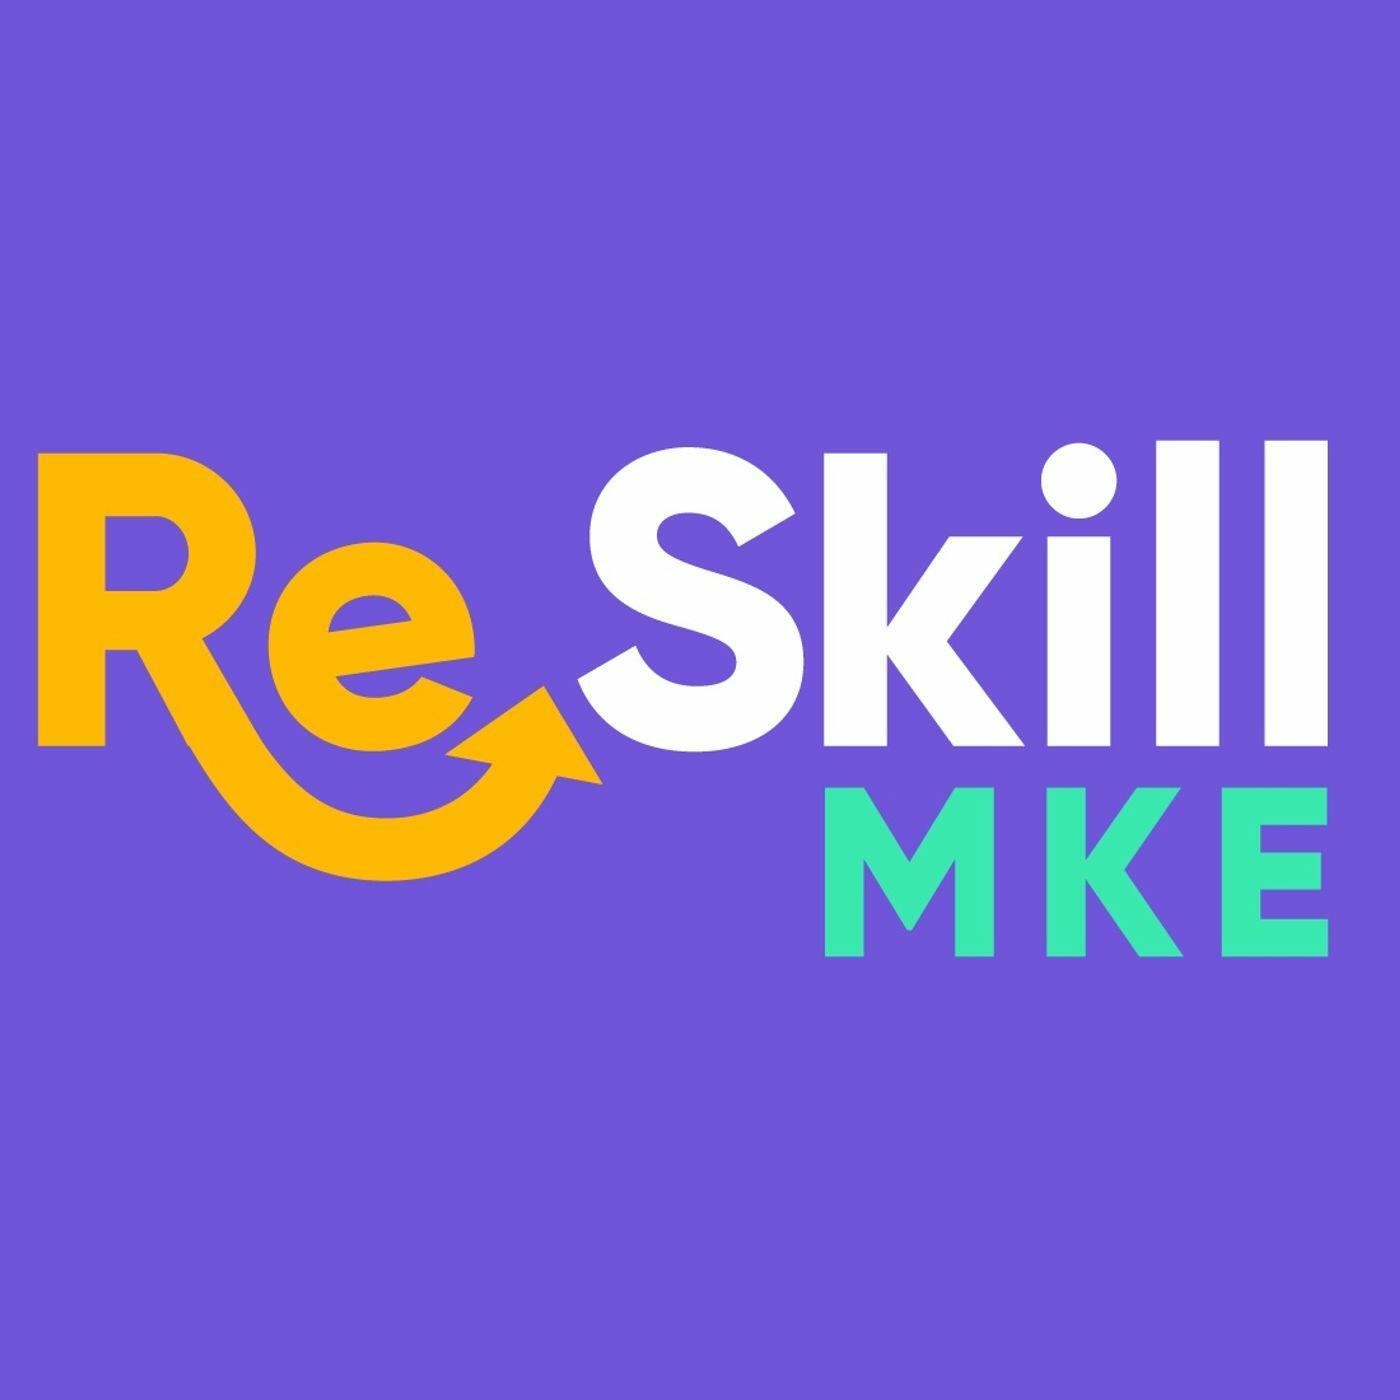 ReSkill MKE